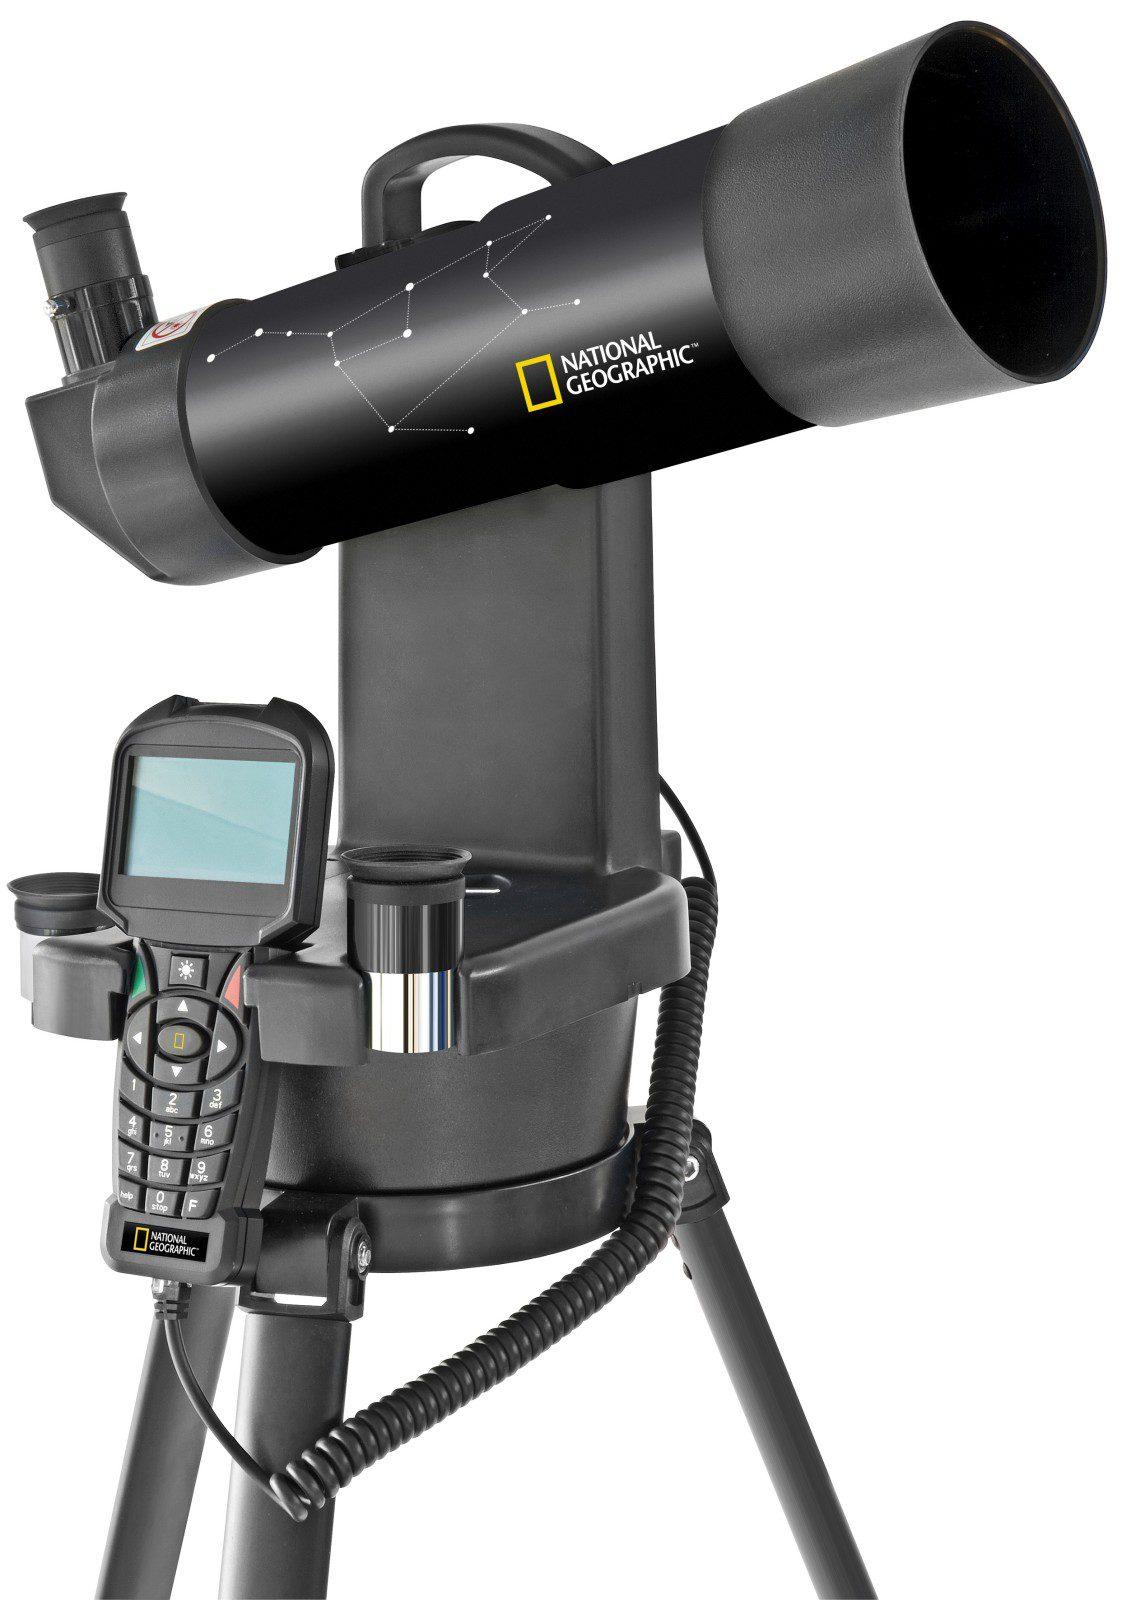 Teleskoparten